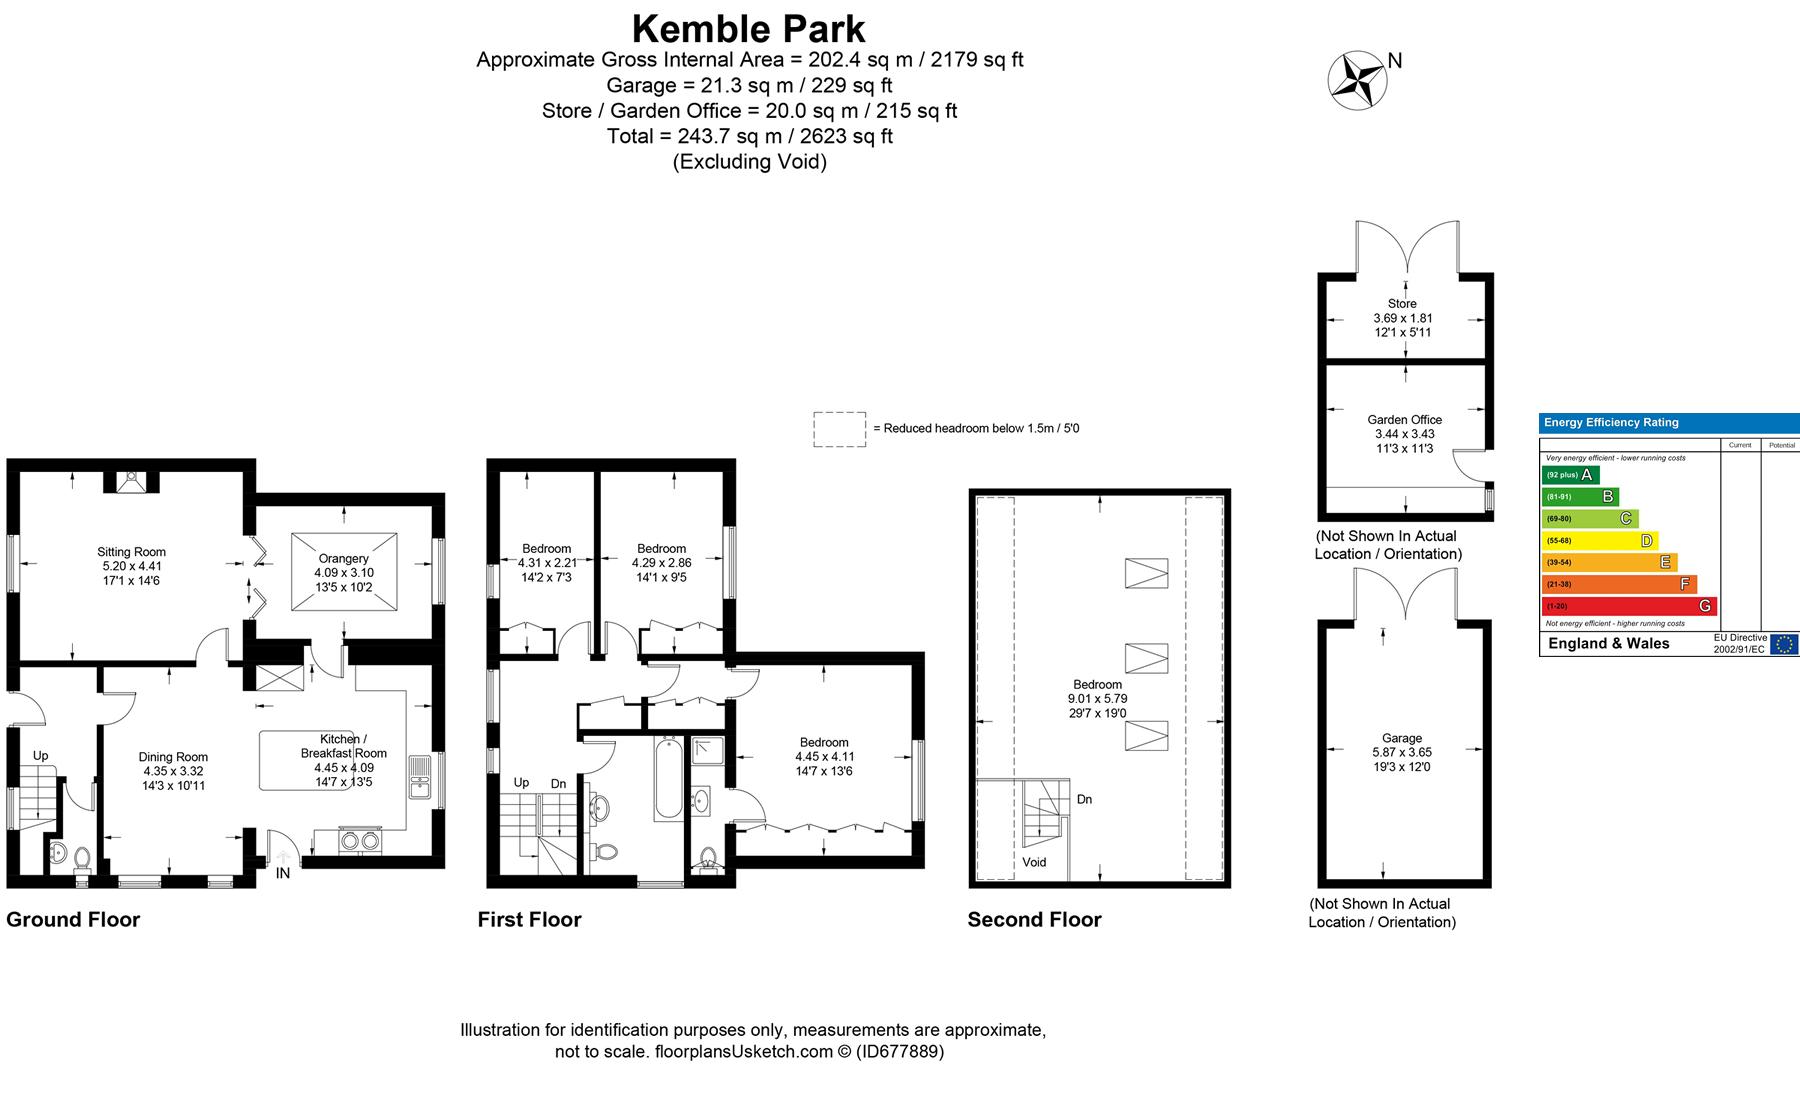 Final_677889_Kemble-Park-BPC_260820163712110